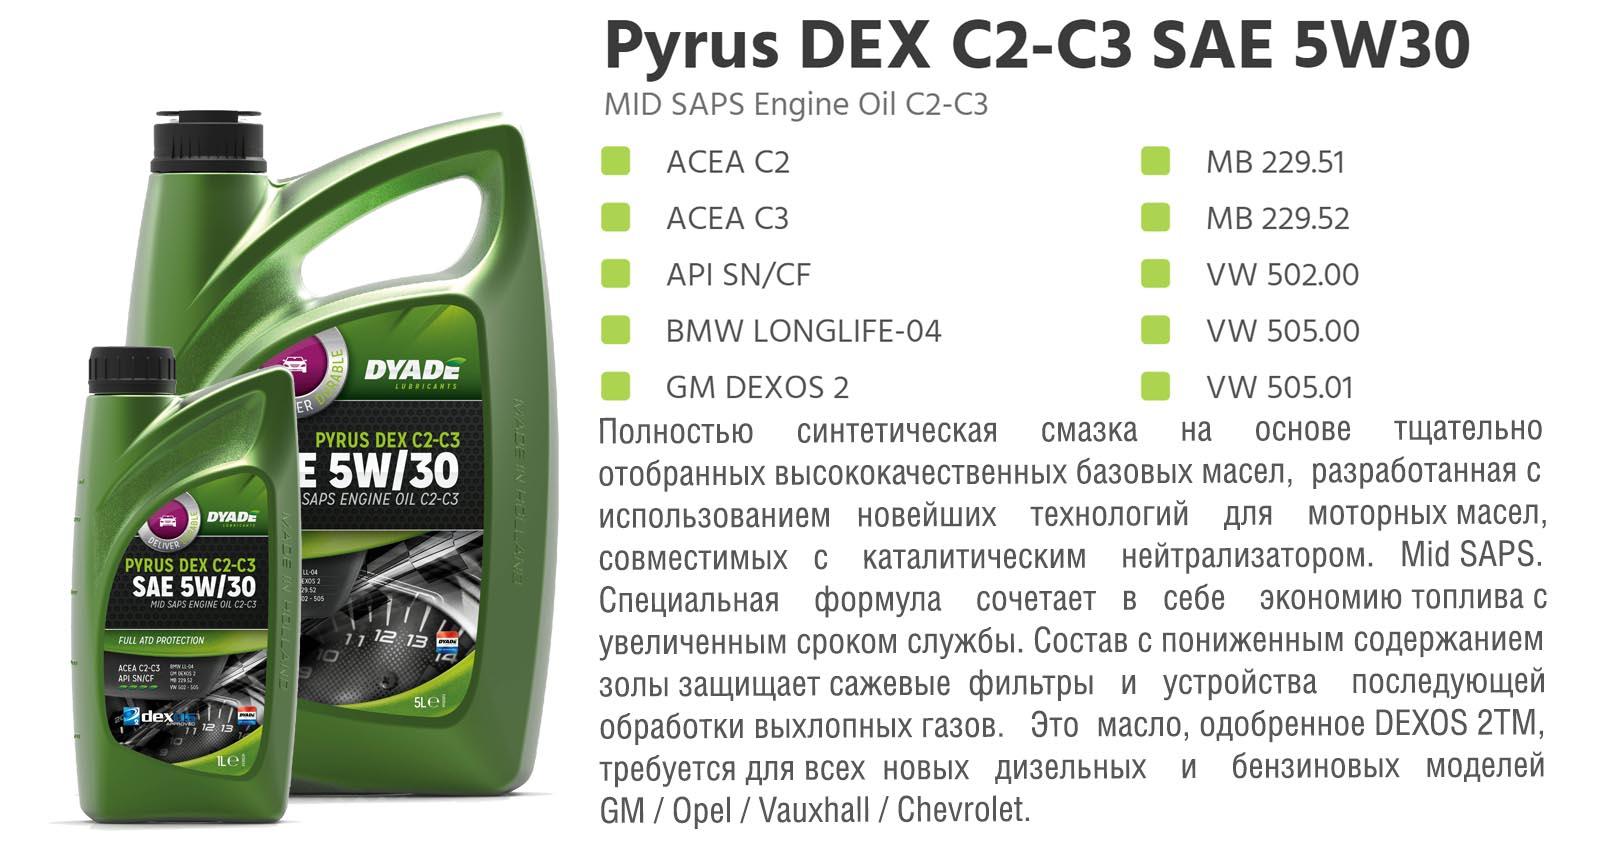 Стеклоочиститель SILENCIO / задний / 180 мм. / 574280 dyadelubricants